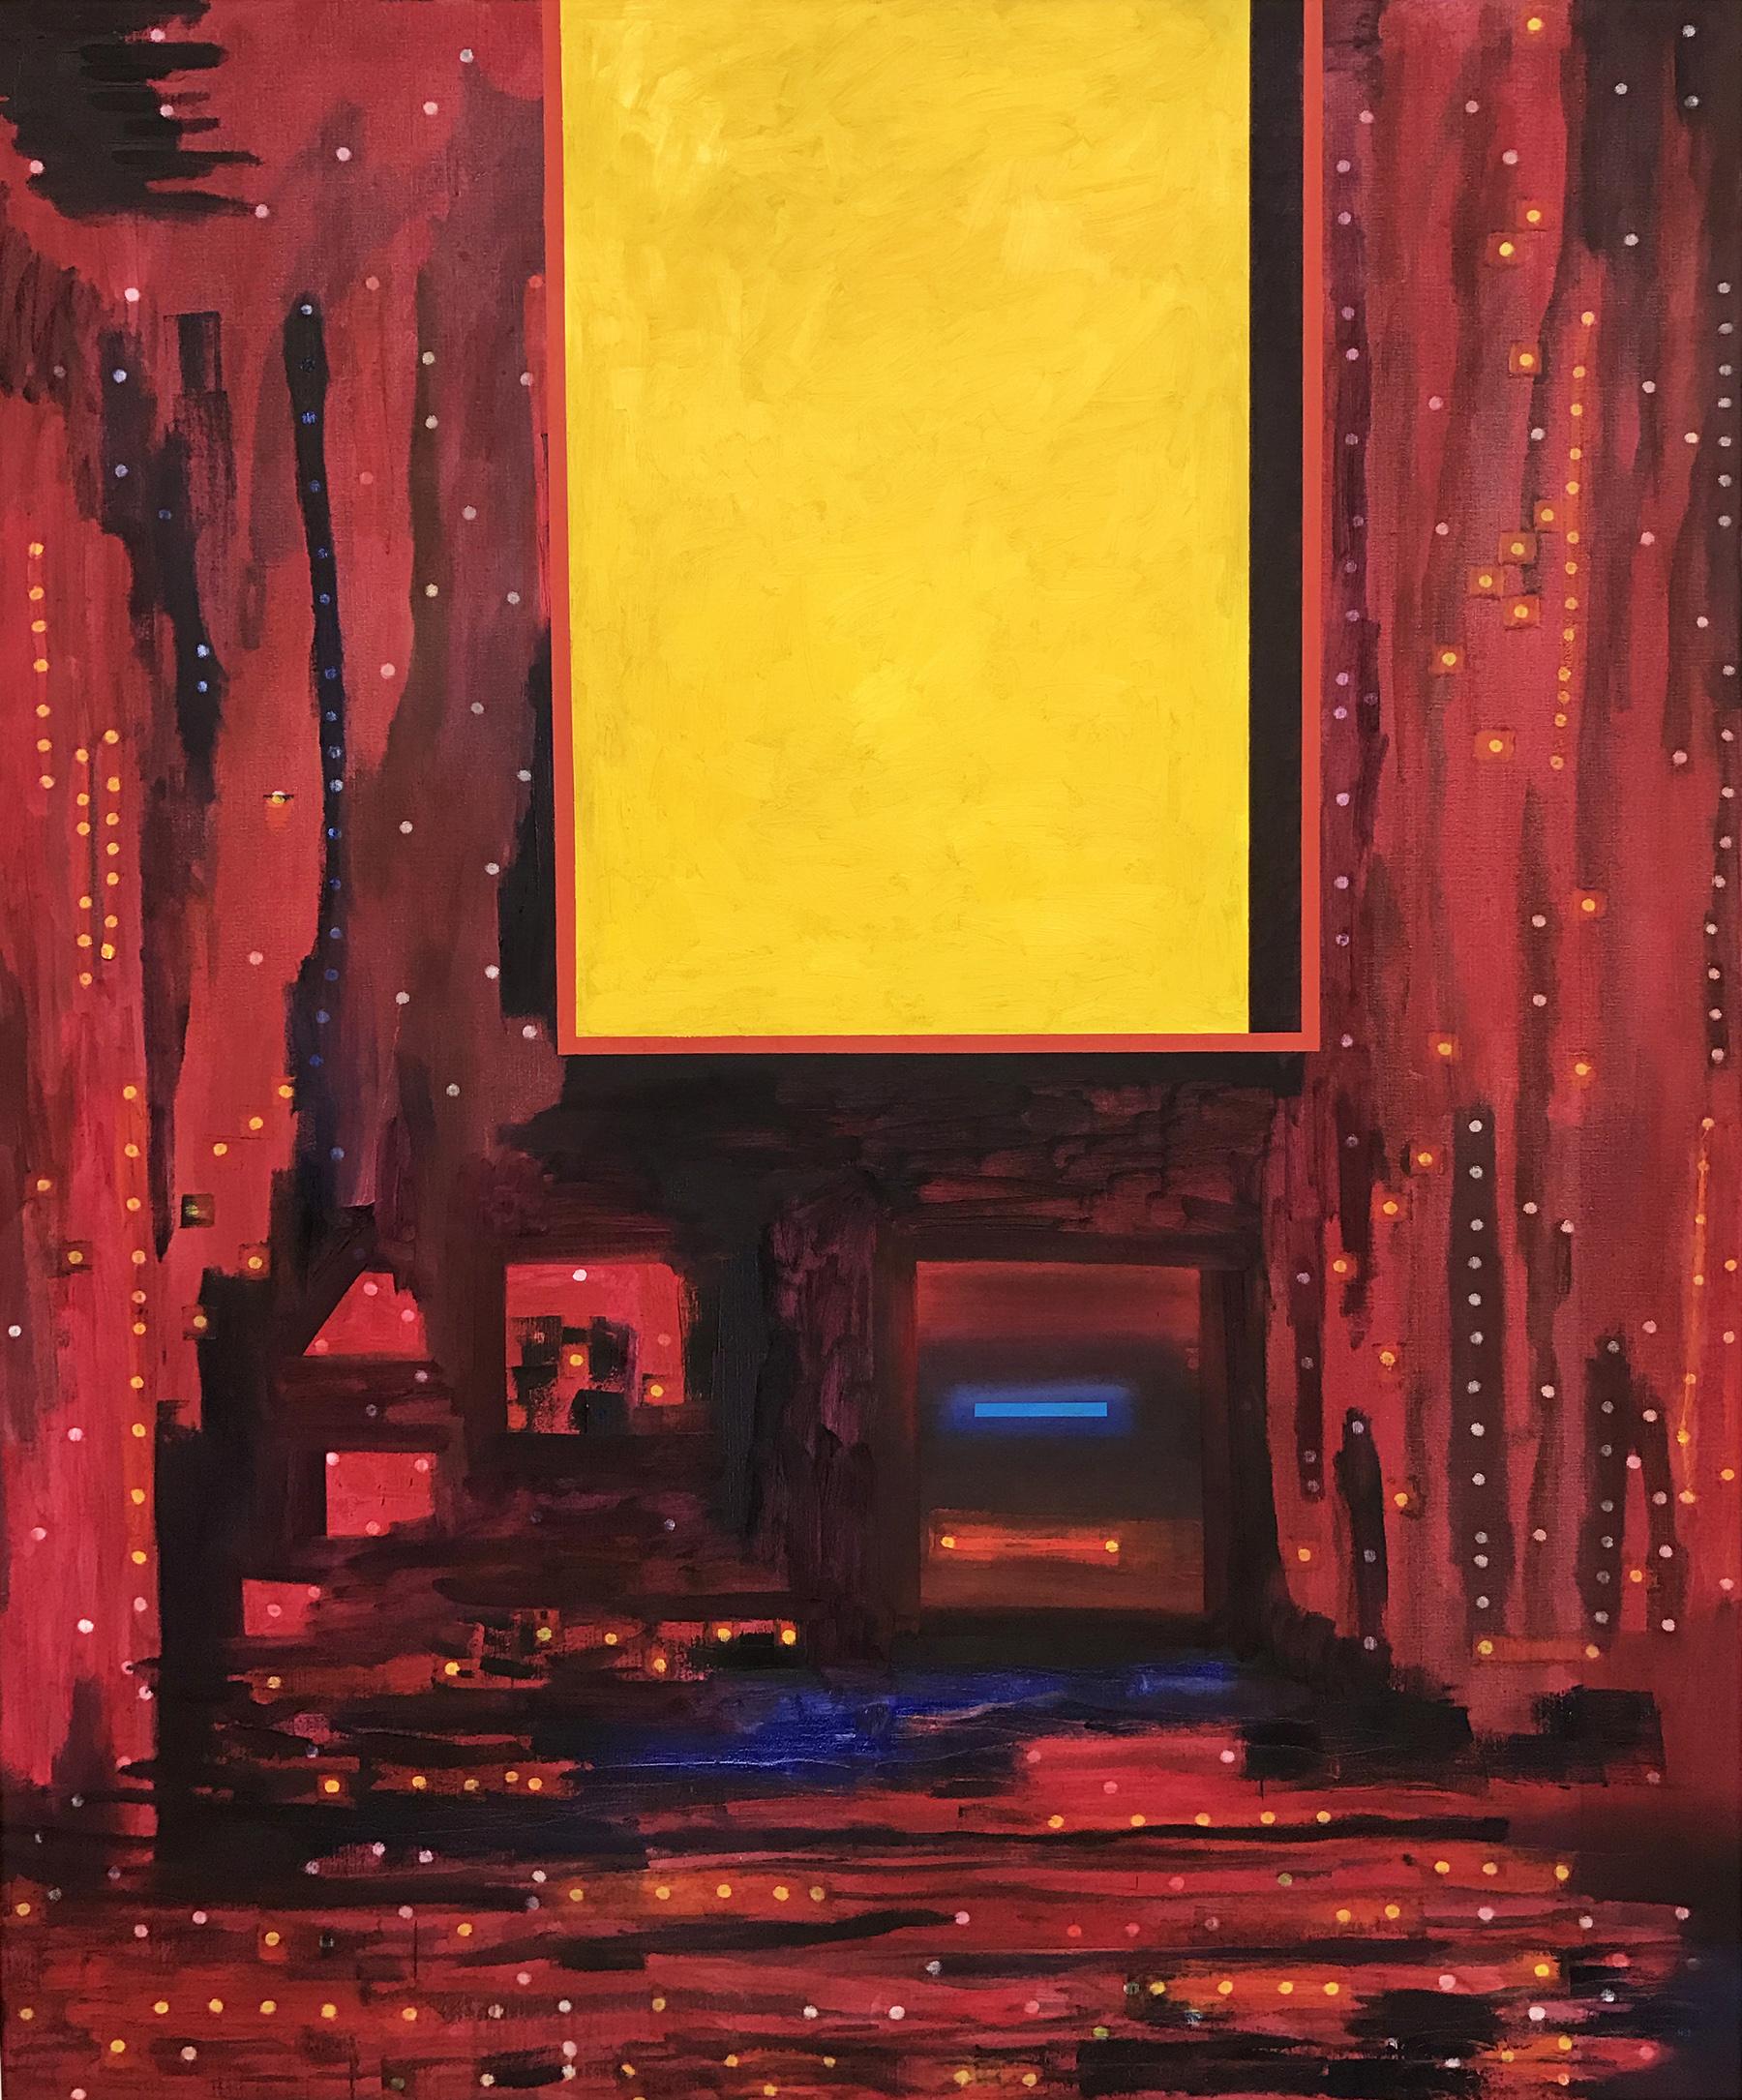 October Land 2 -oil on canvas 195 x 162 cm- 2016 Miquel Gelabert